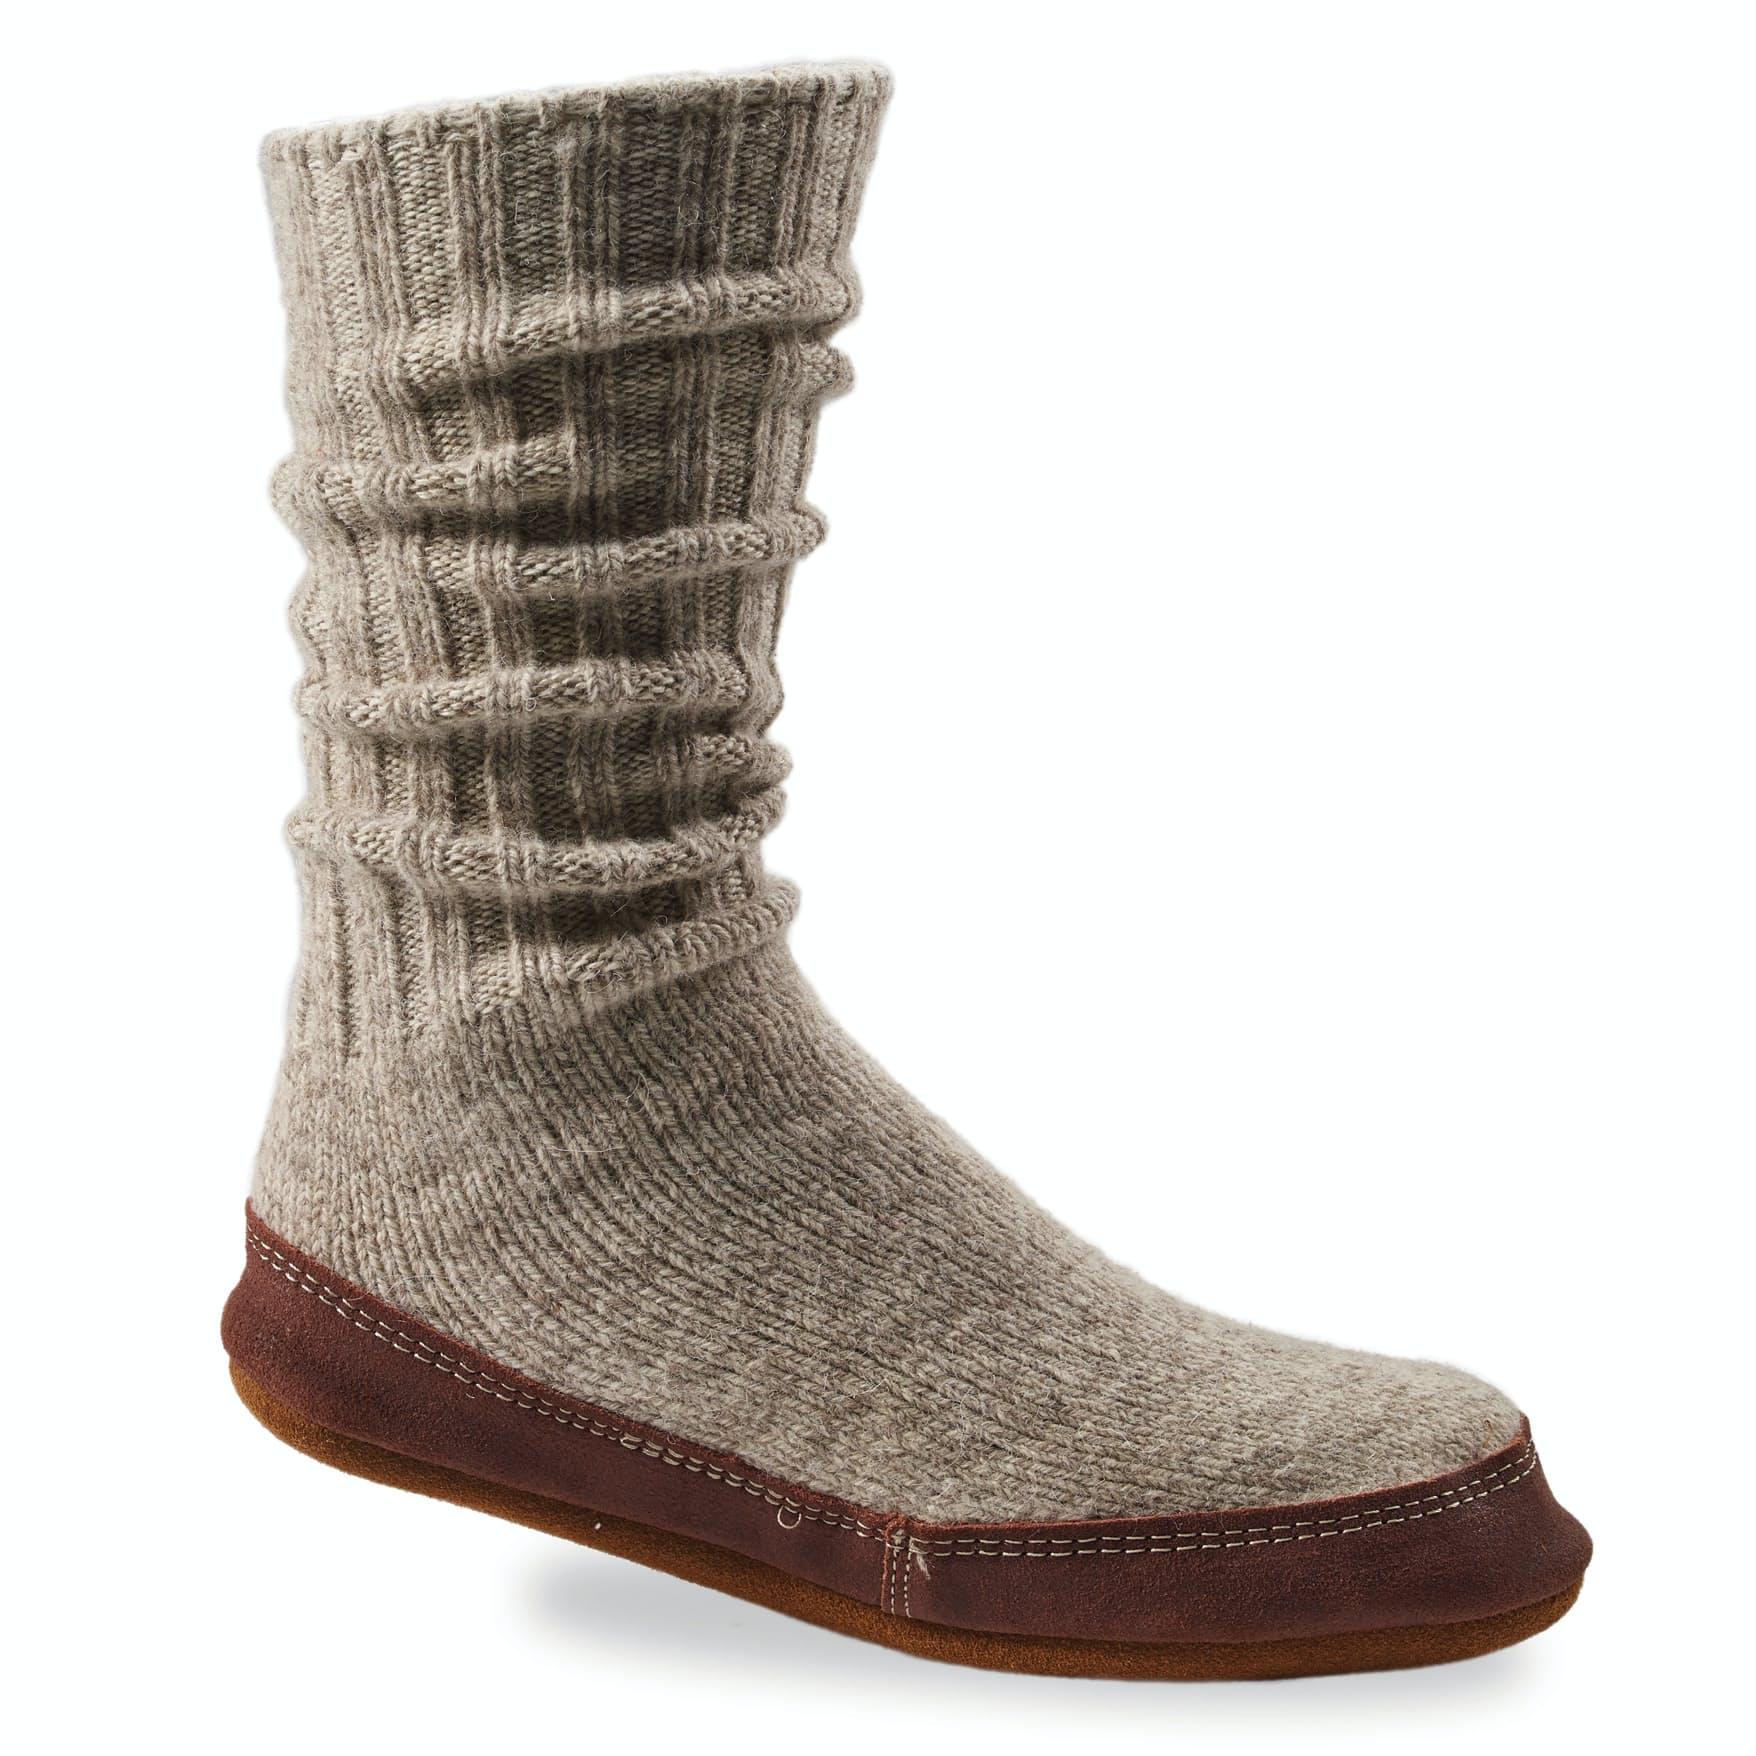 Ayahvdjwj7 acorn astronaut slippers 0 original